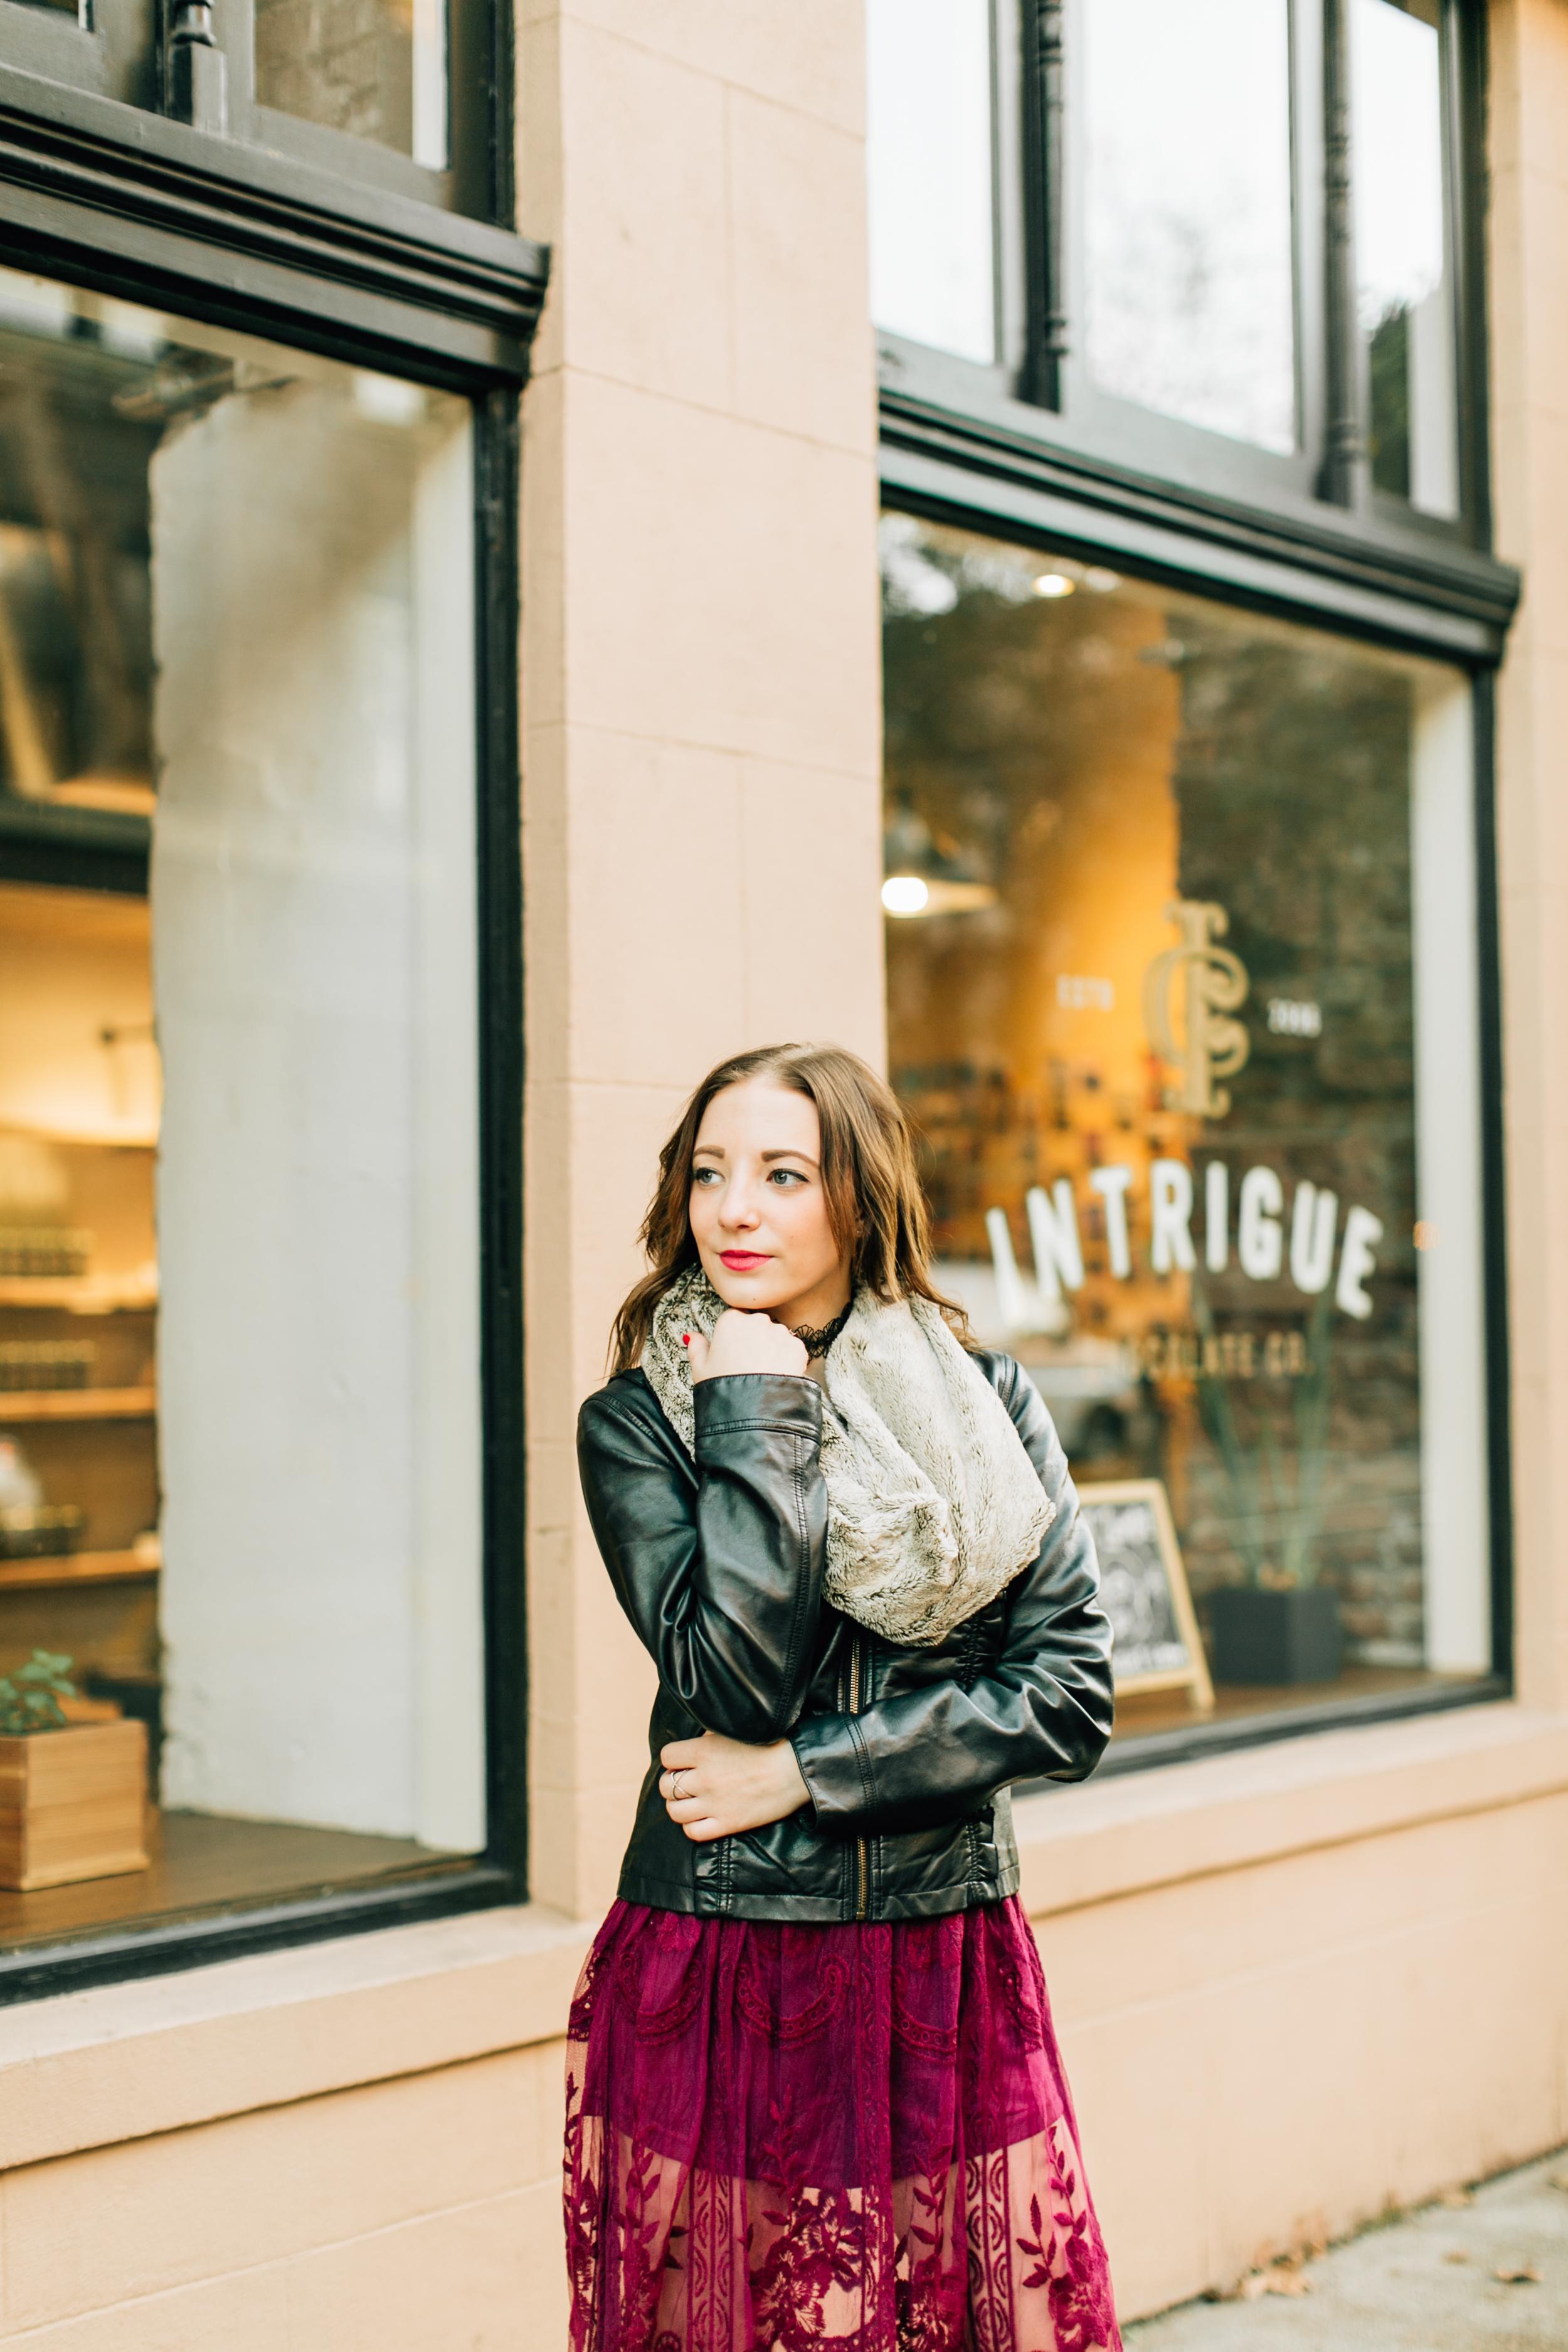 SeattleFashionPhotographer-46.jpg